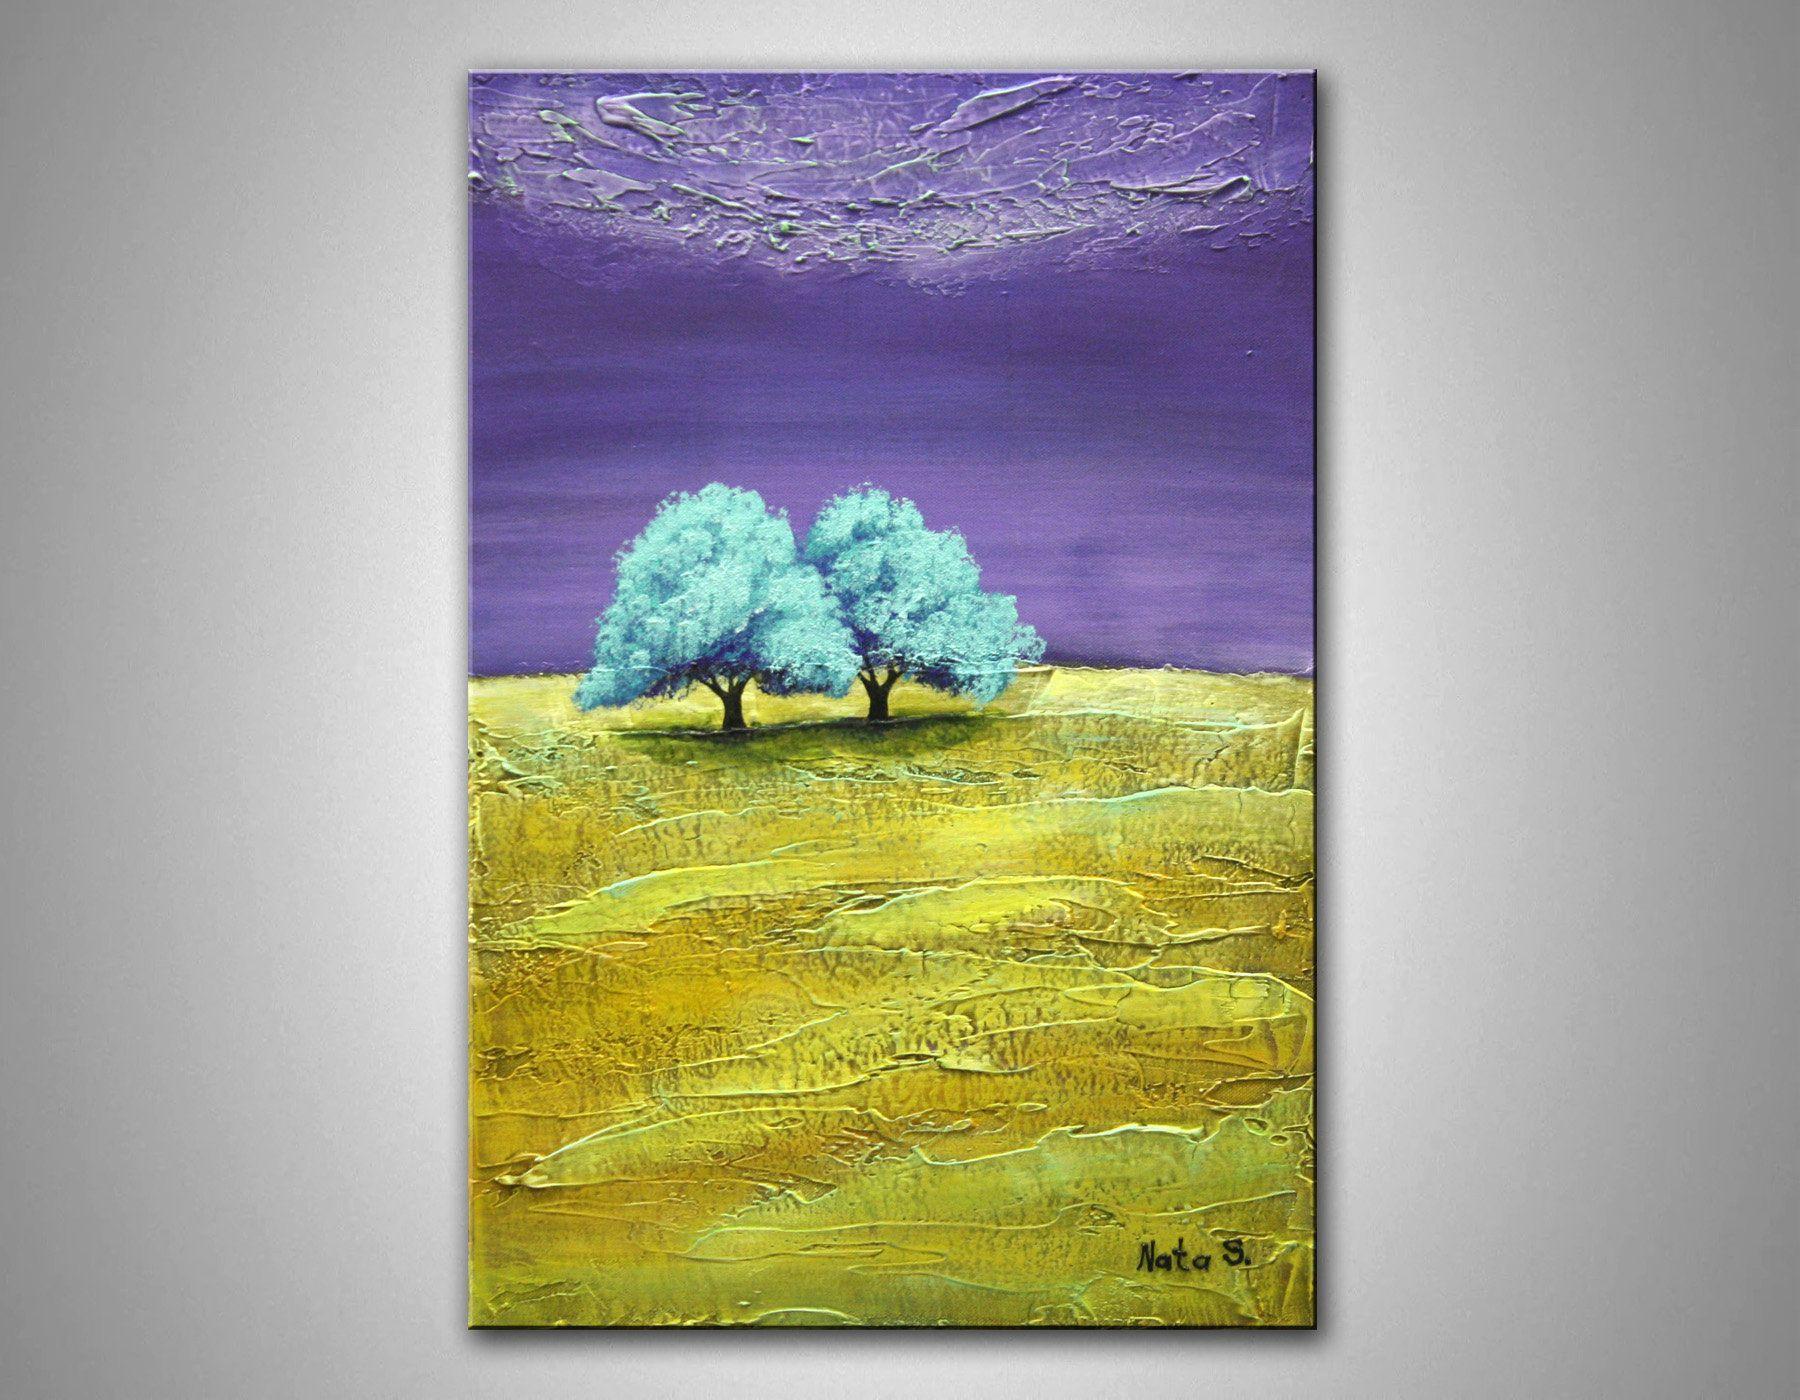 Landscape Original Painting Canvas Art Acrylic Painting Mixed Media Art Tree Painting Seasons Contemporary Art Home Wall Decor by Nata Landscape Original Painting Canvas...